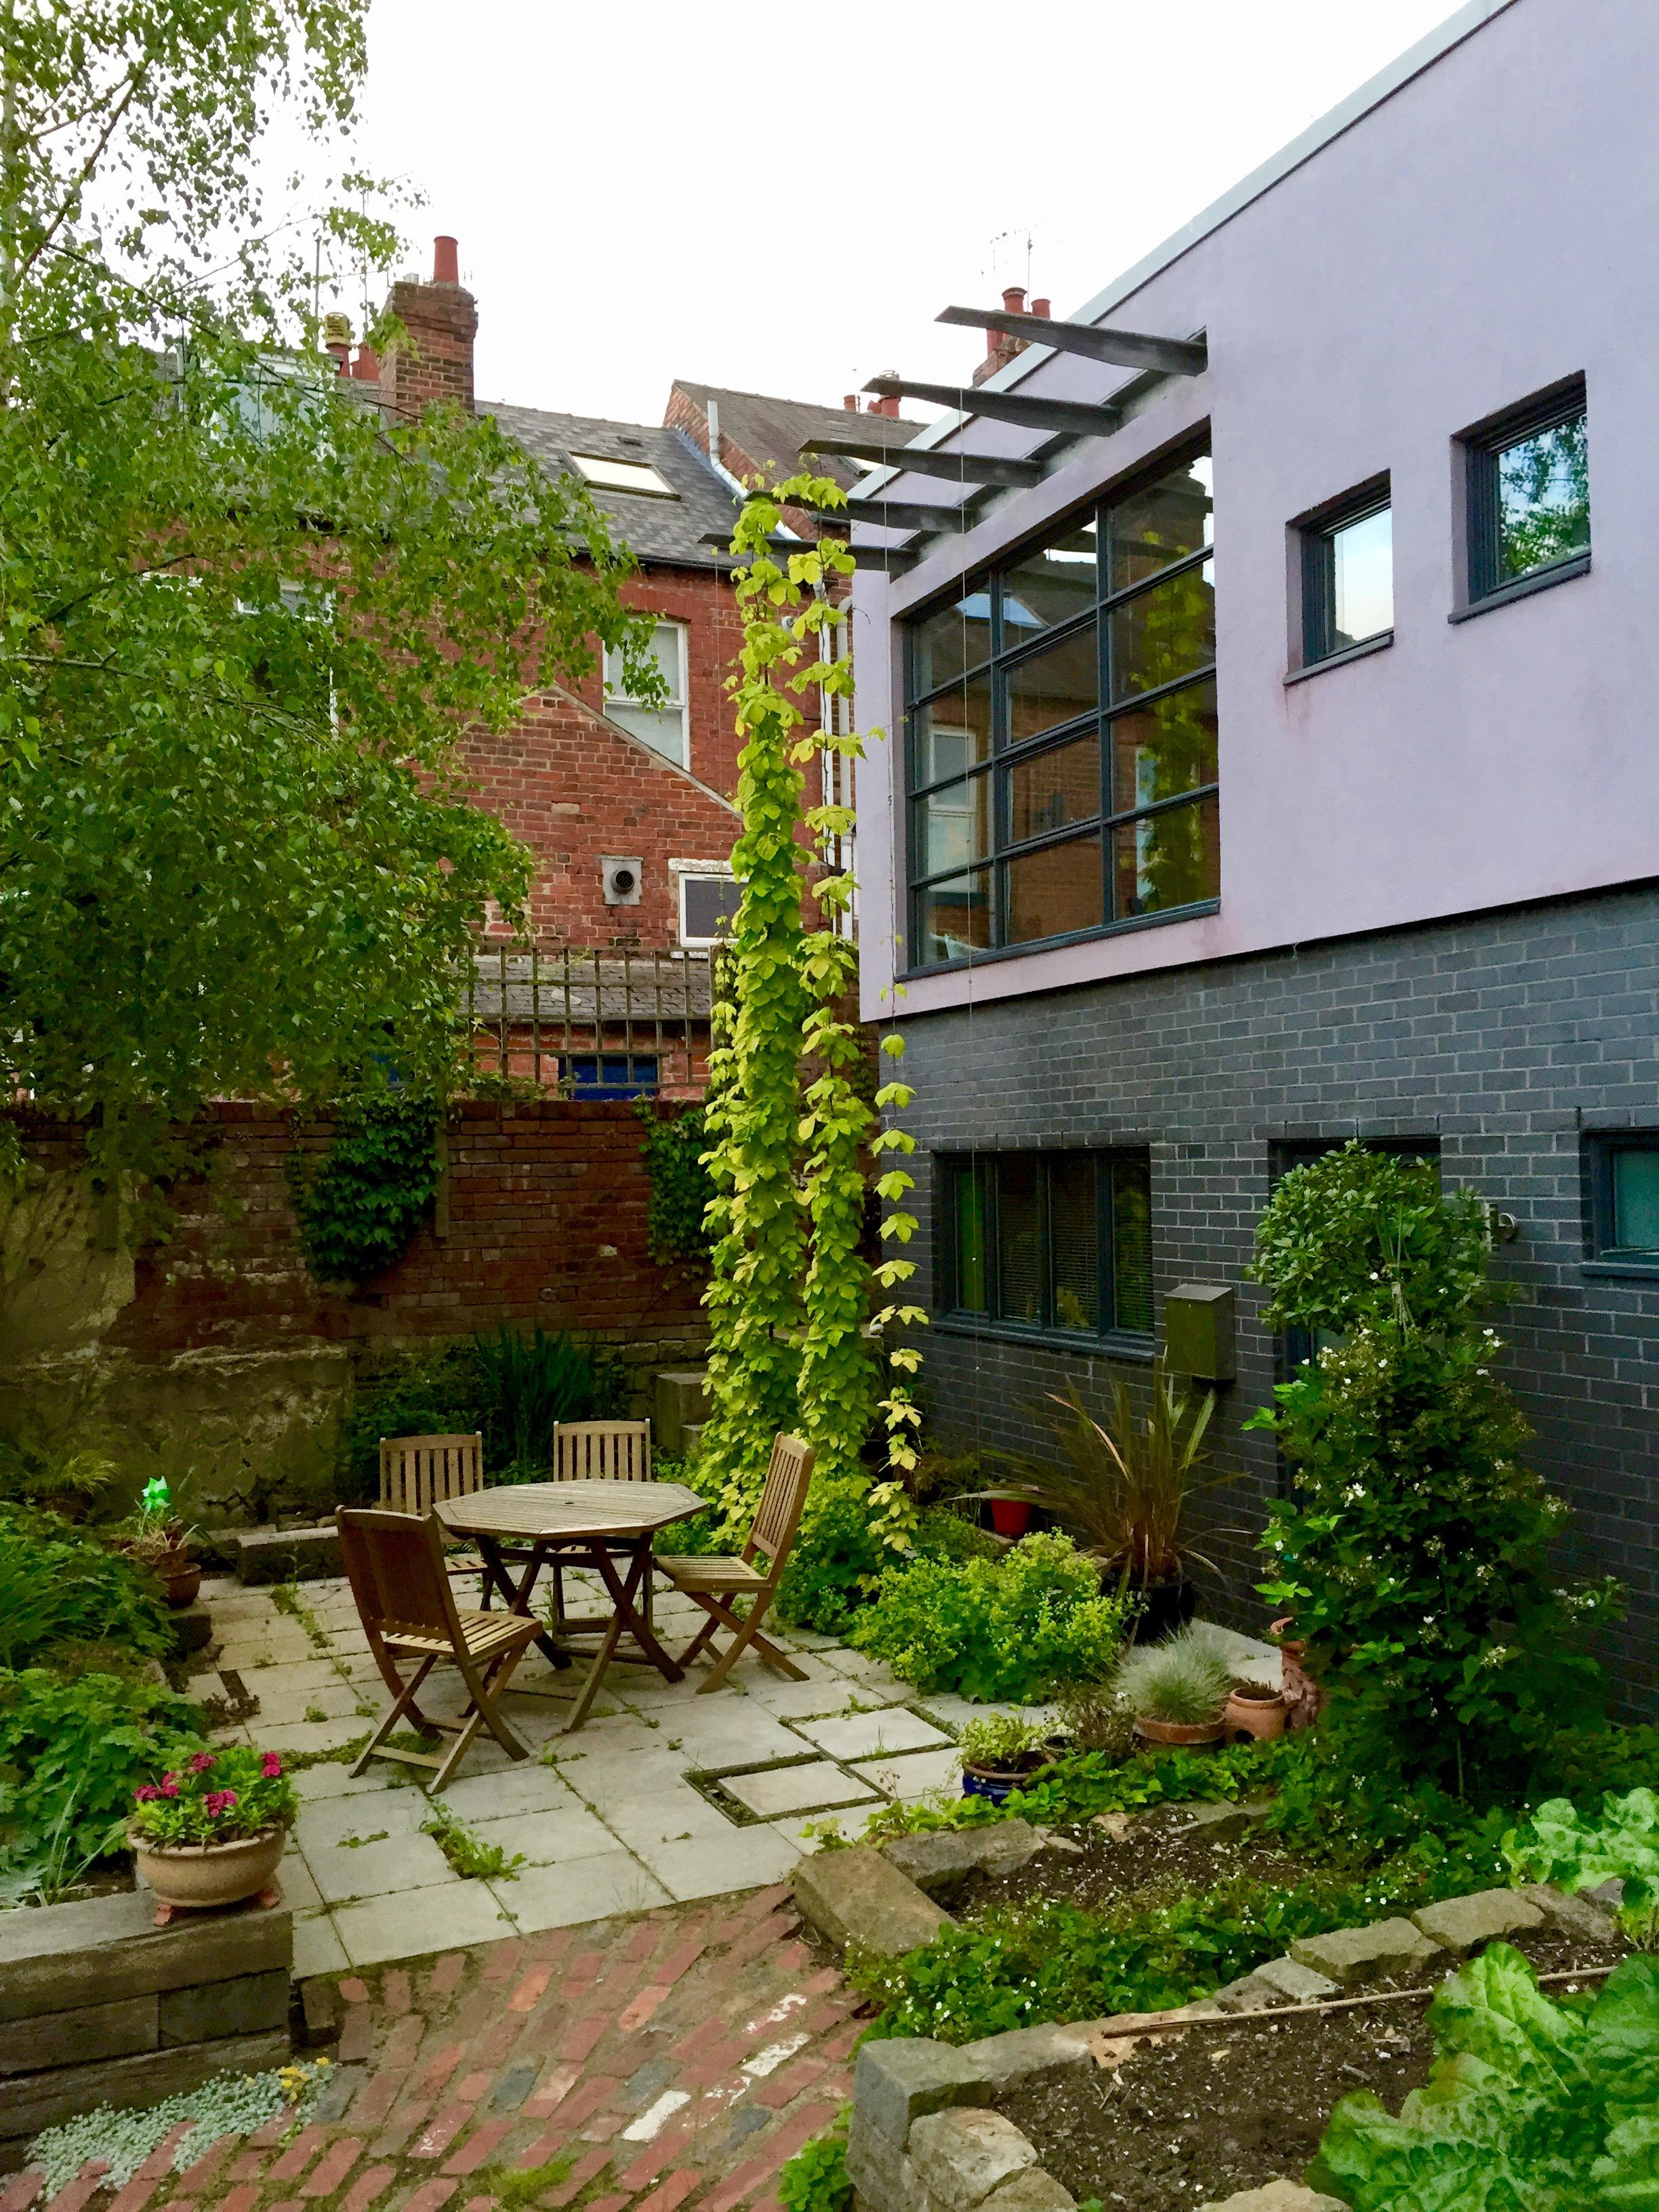 House photos for AVF - 1 (3).jpg